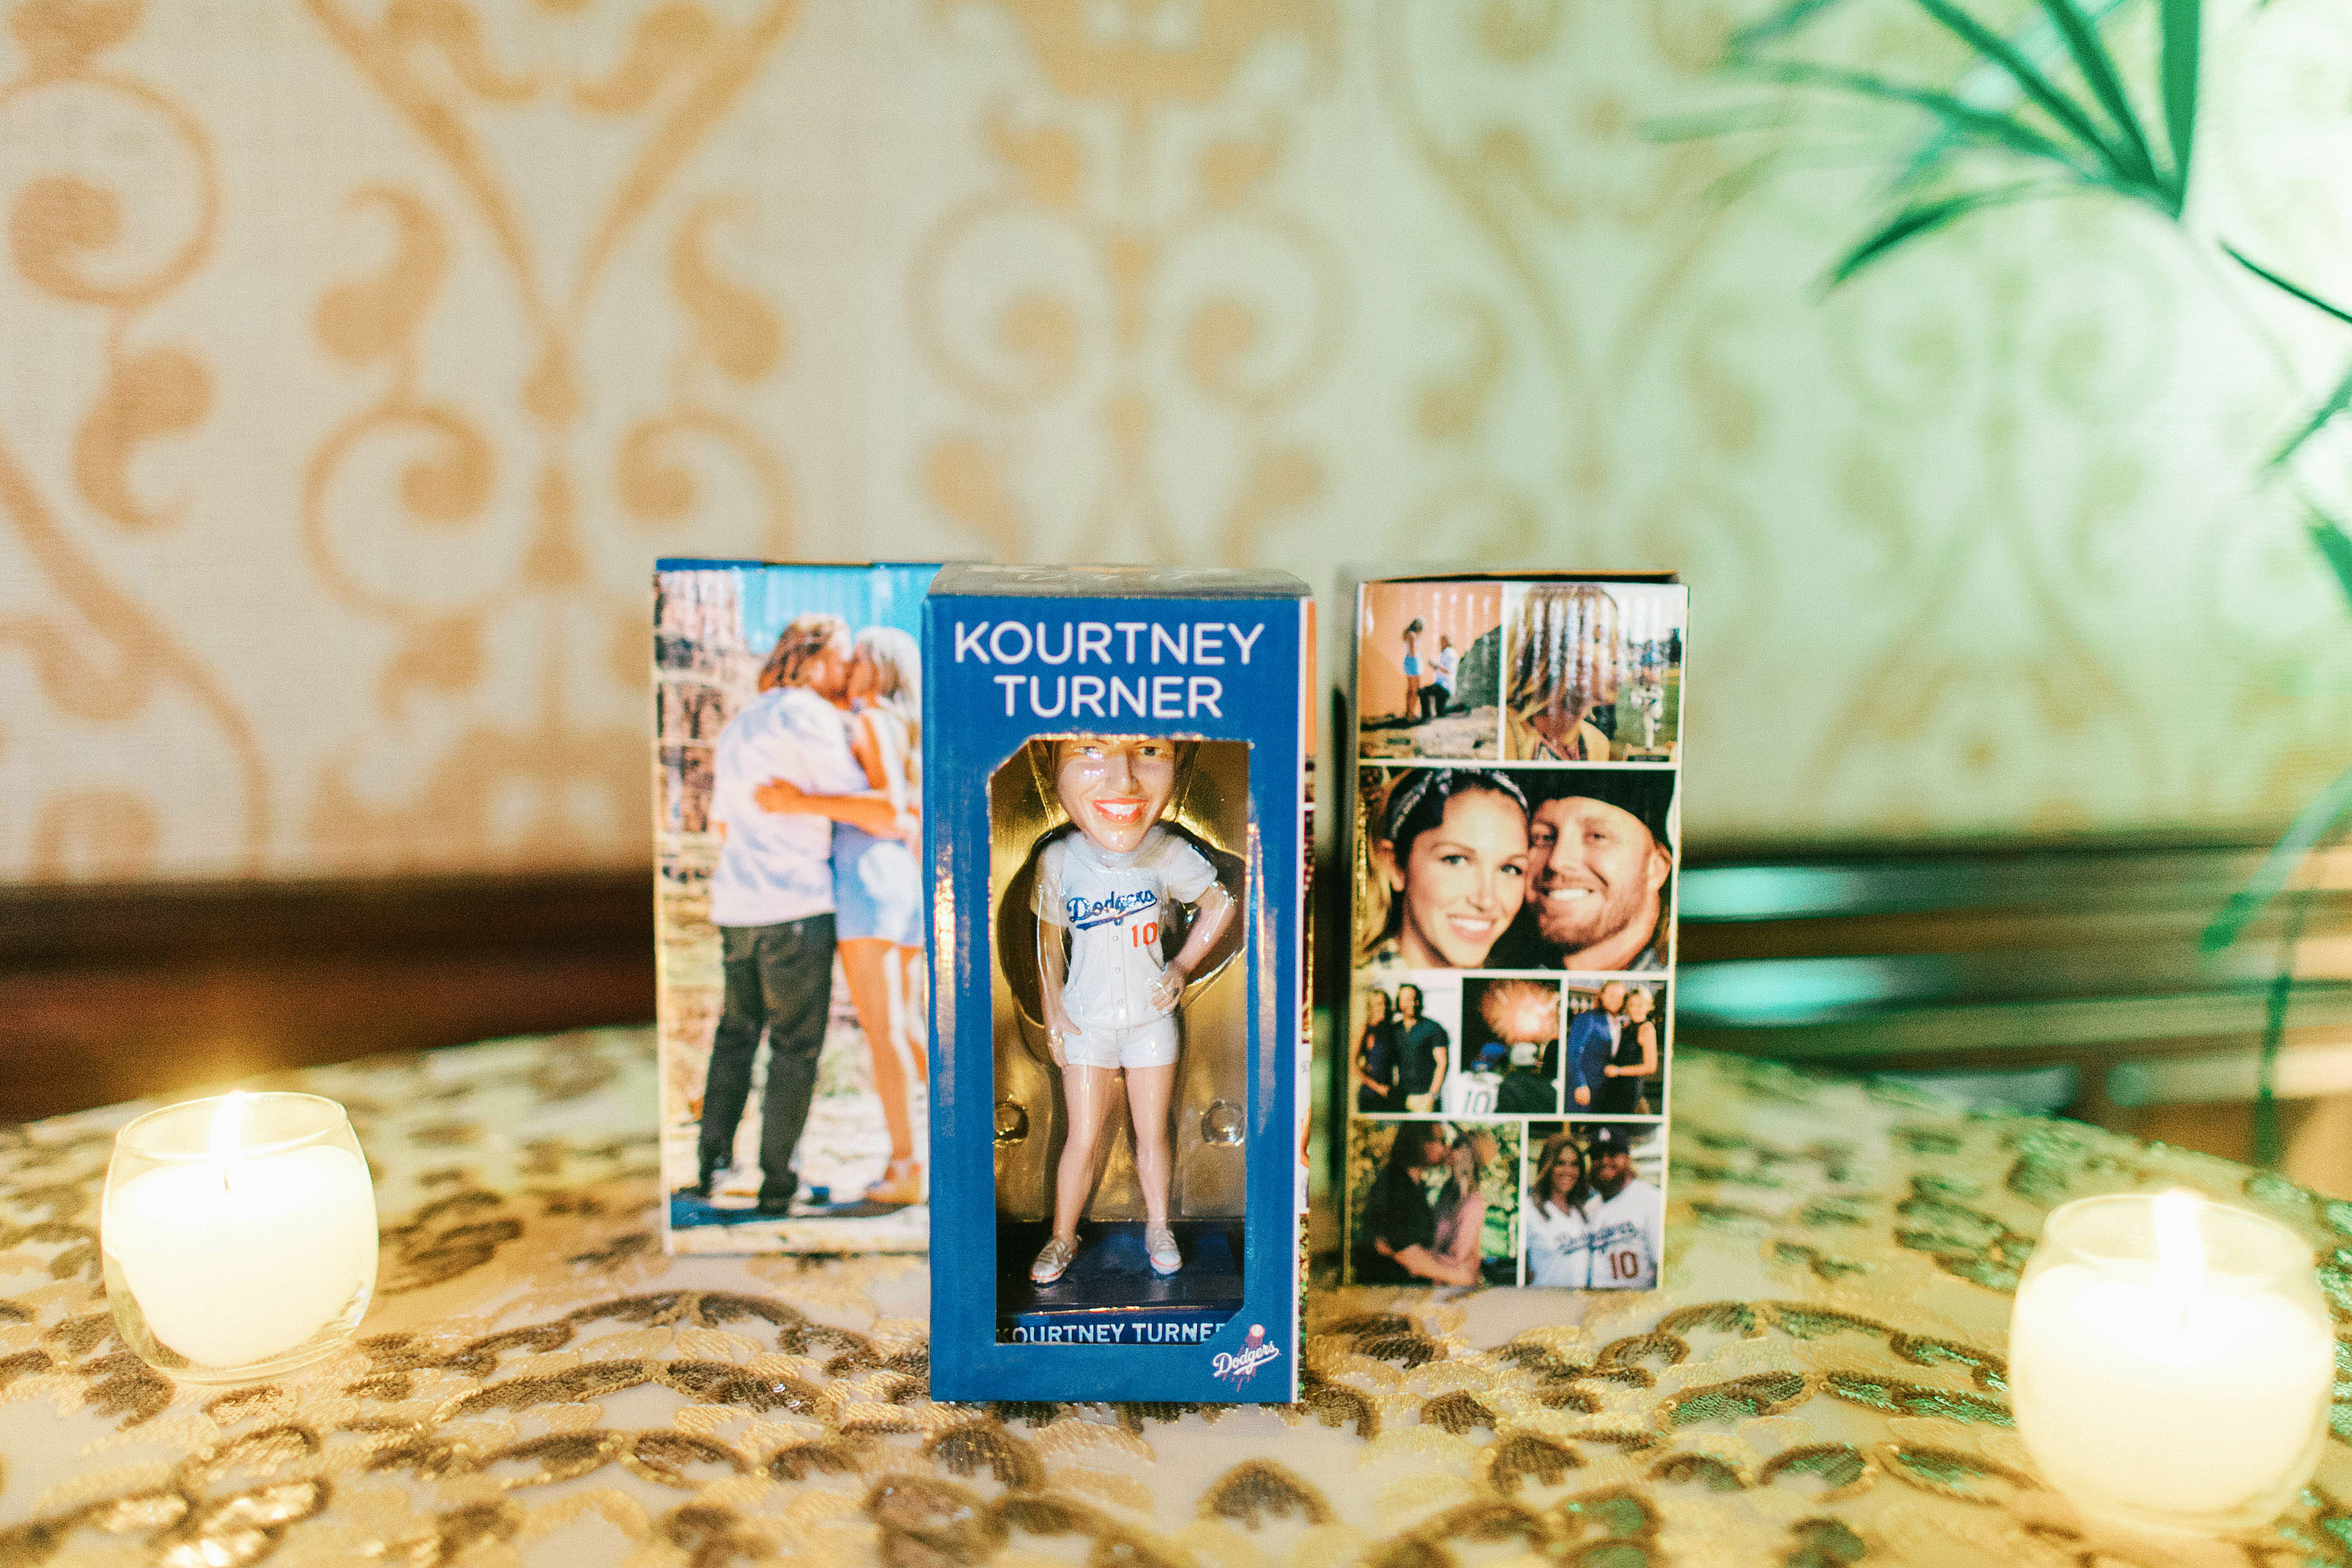 kourtney justin wedding mexico bobble heads